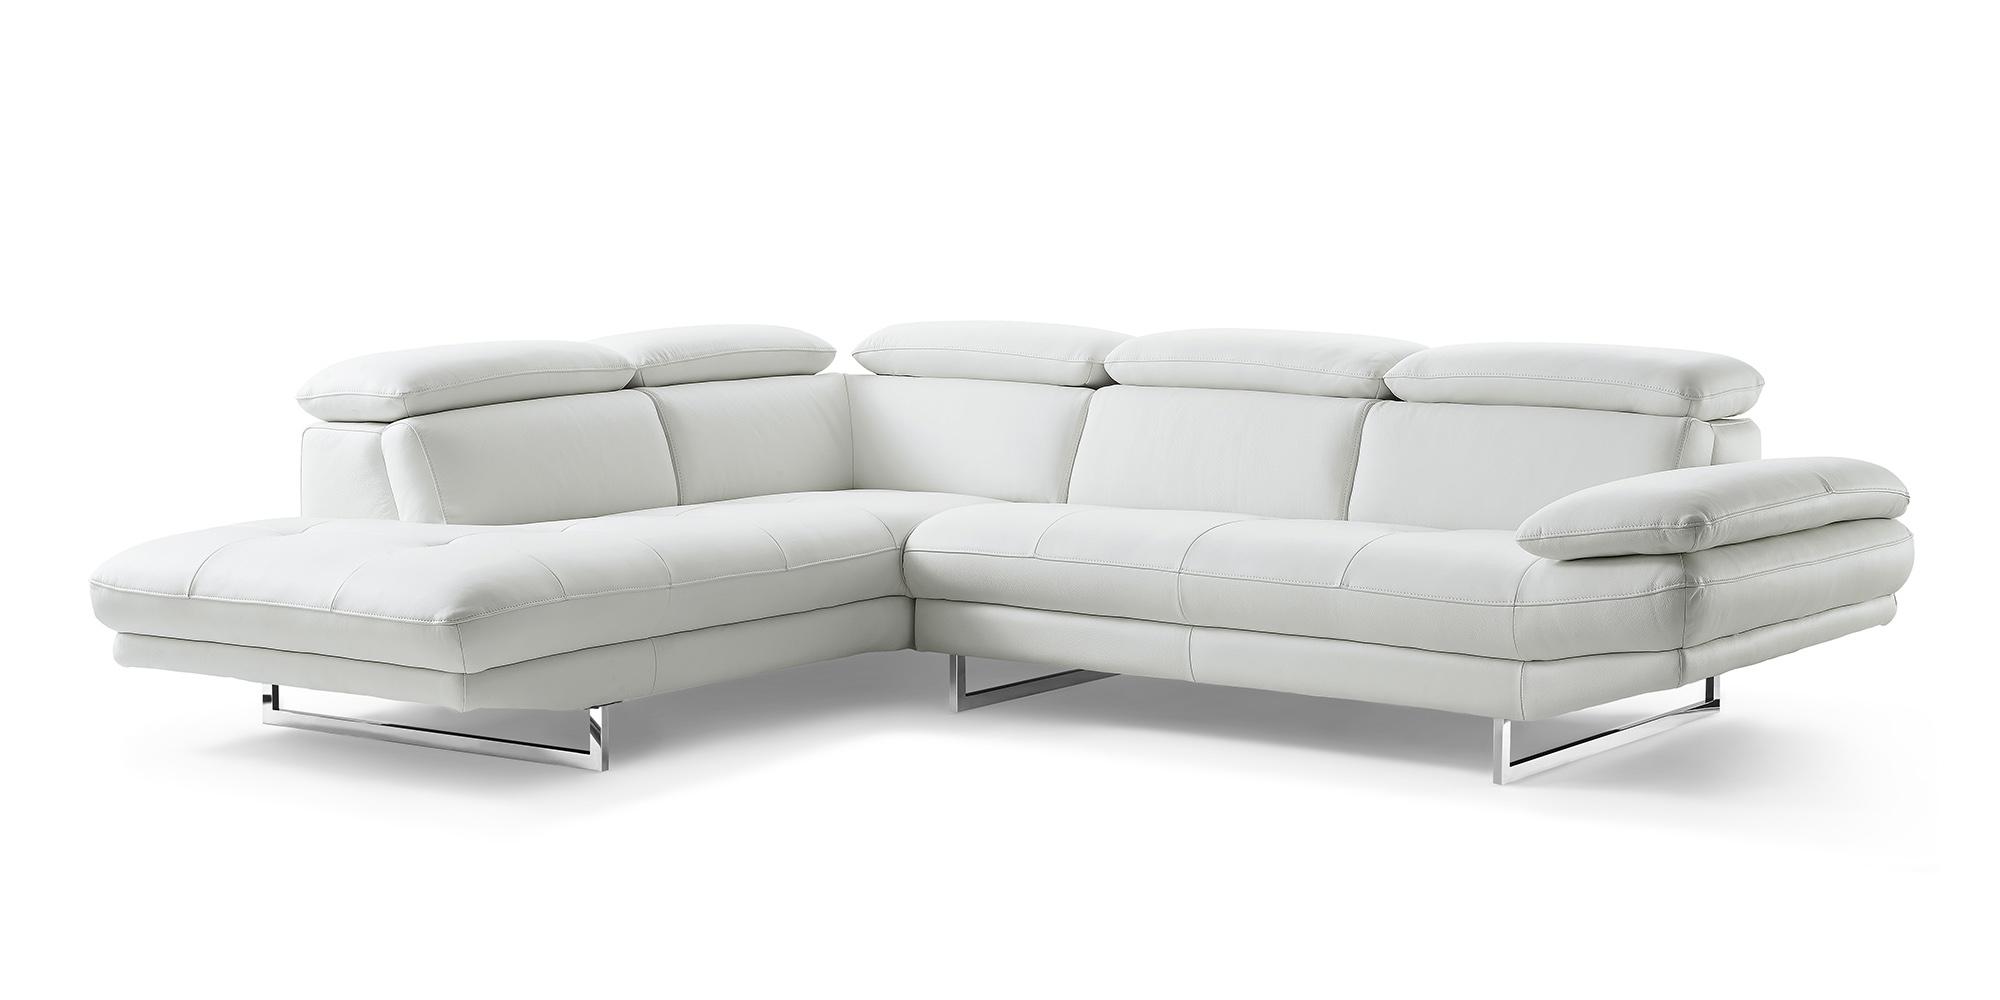 Adjustable Advanced Tufted Corner Sectional L-shape Sofa ...